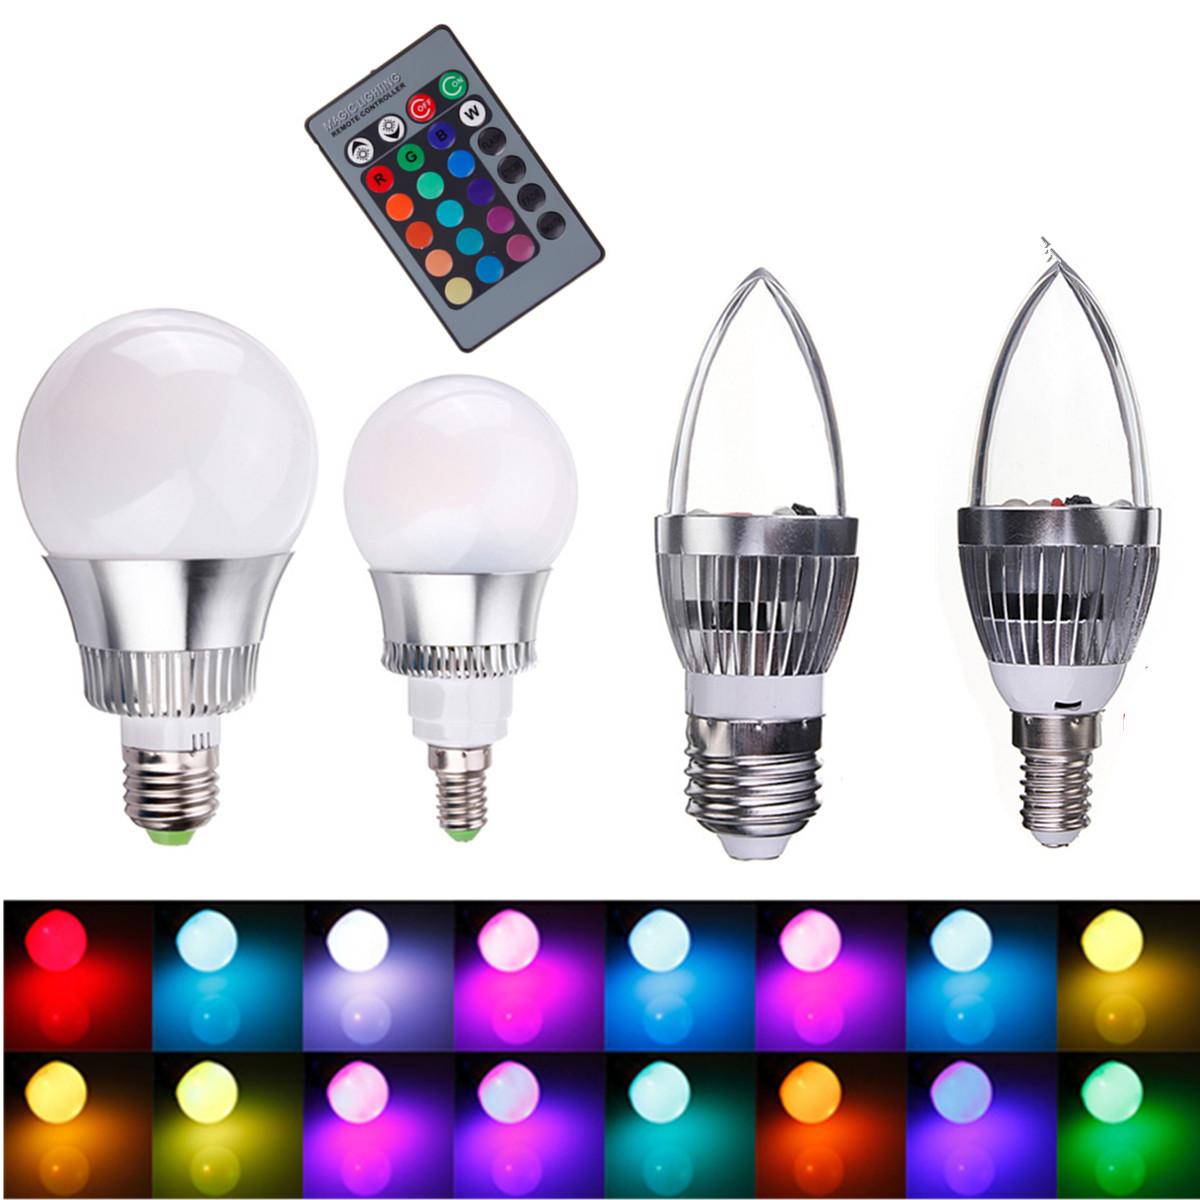 5w 10w lampada e27 e14 rgb led lampadina faretto multicolore luce controller ebay. Black Bedroom Furniture Sets. Home Design Ideas